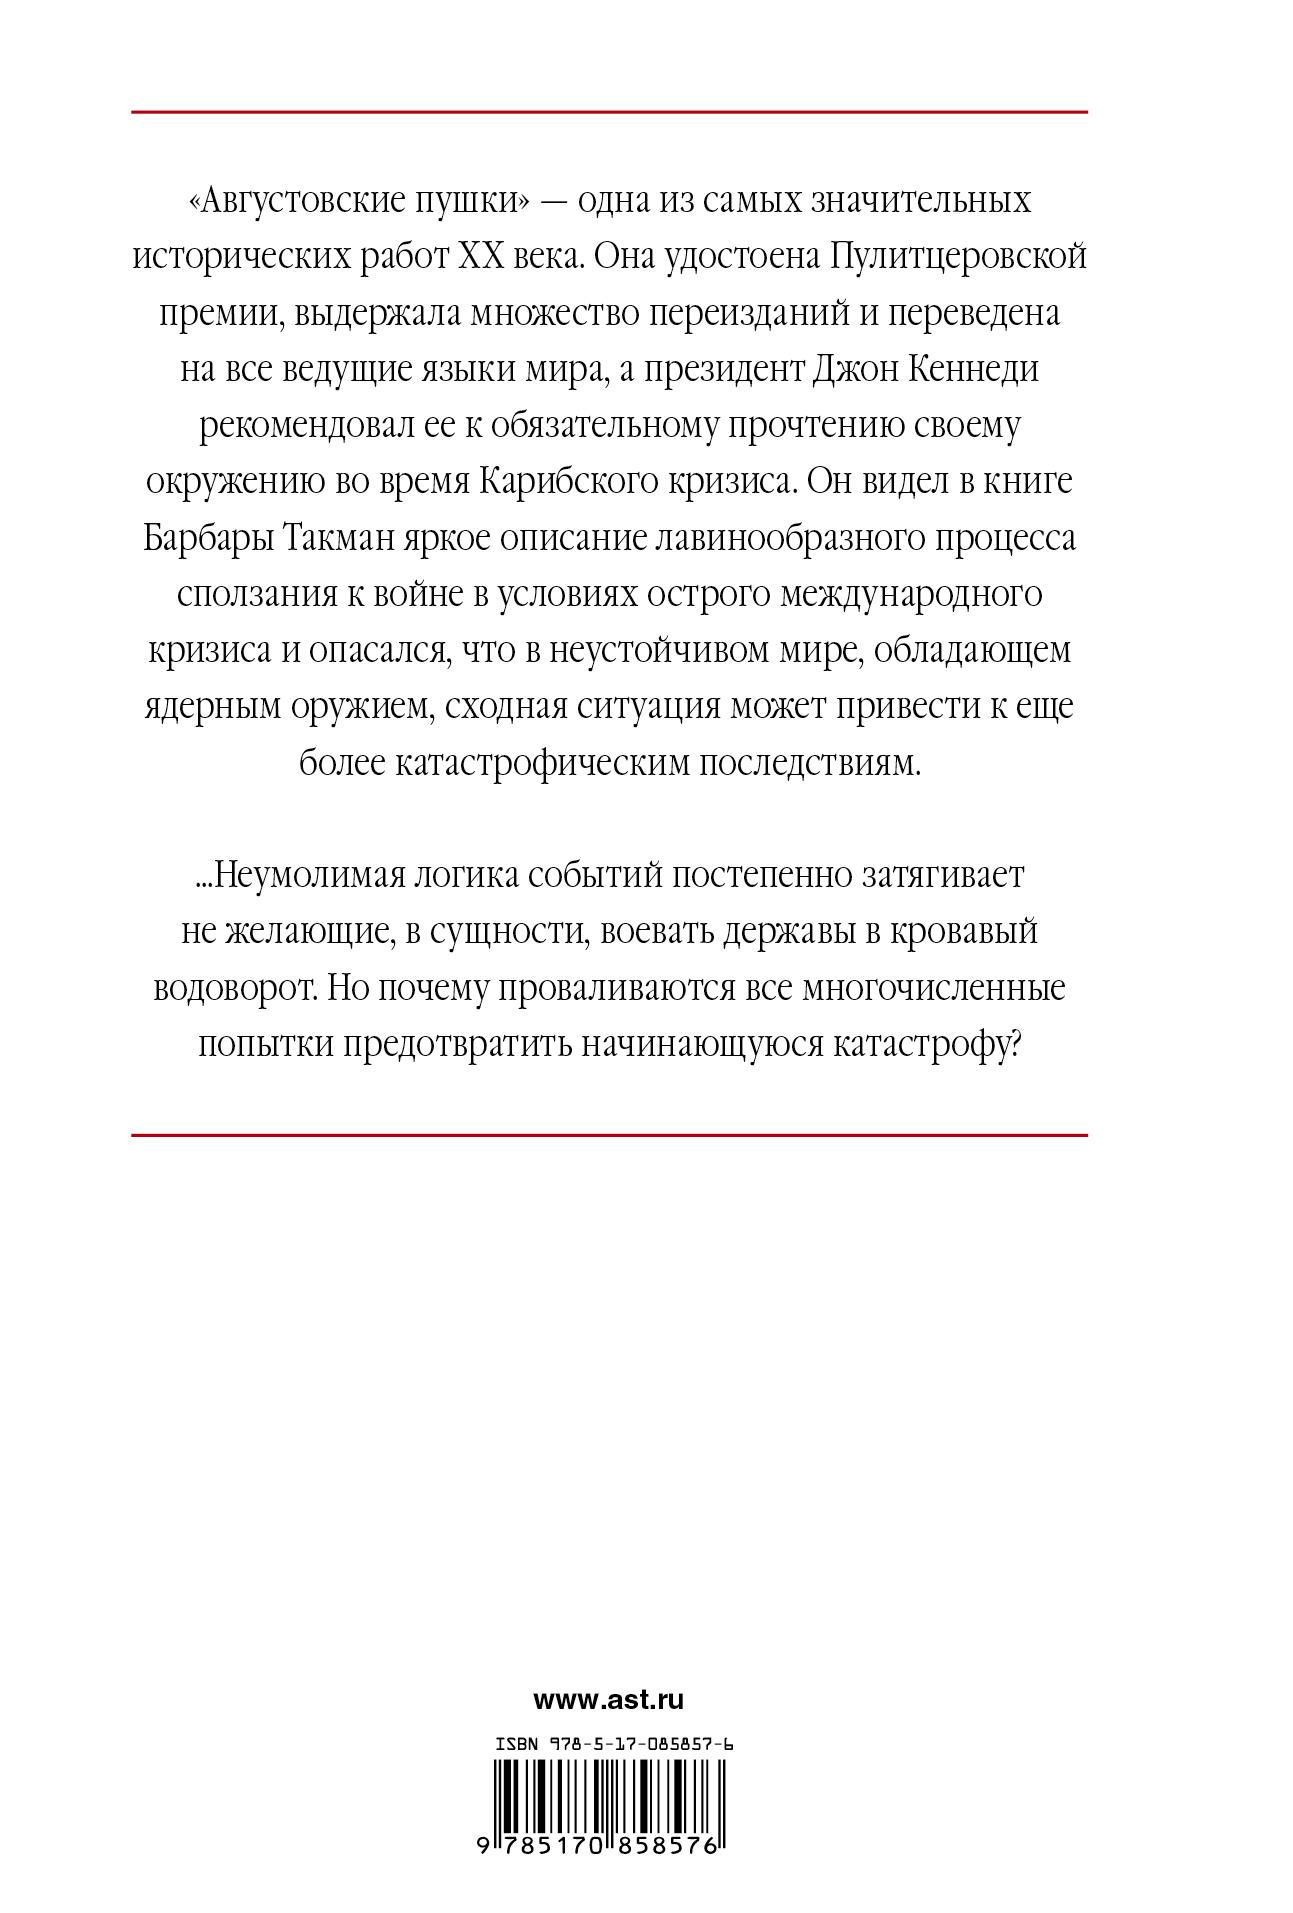 Барбара Такман. Августовские пушки